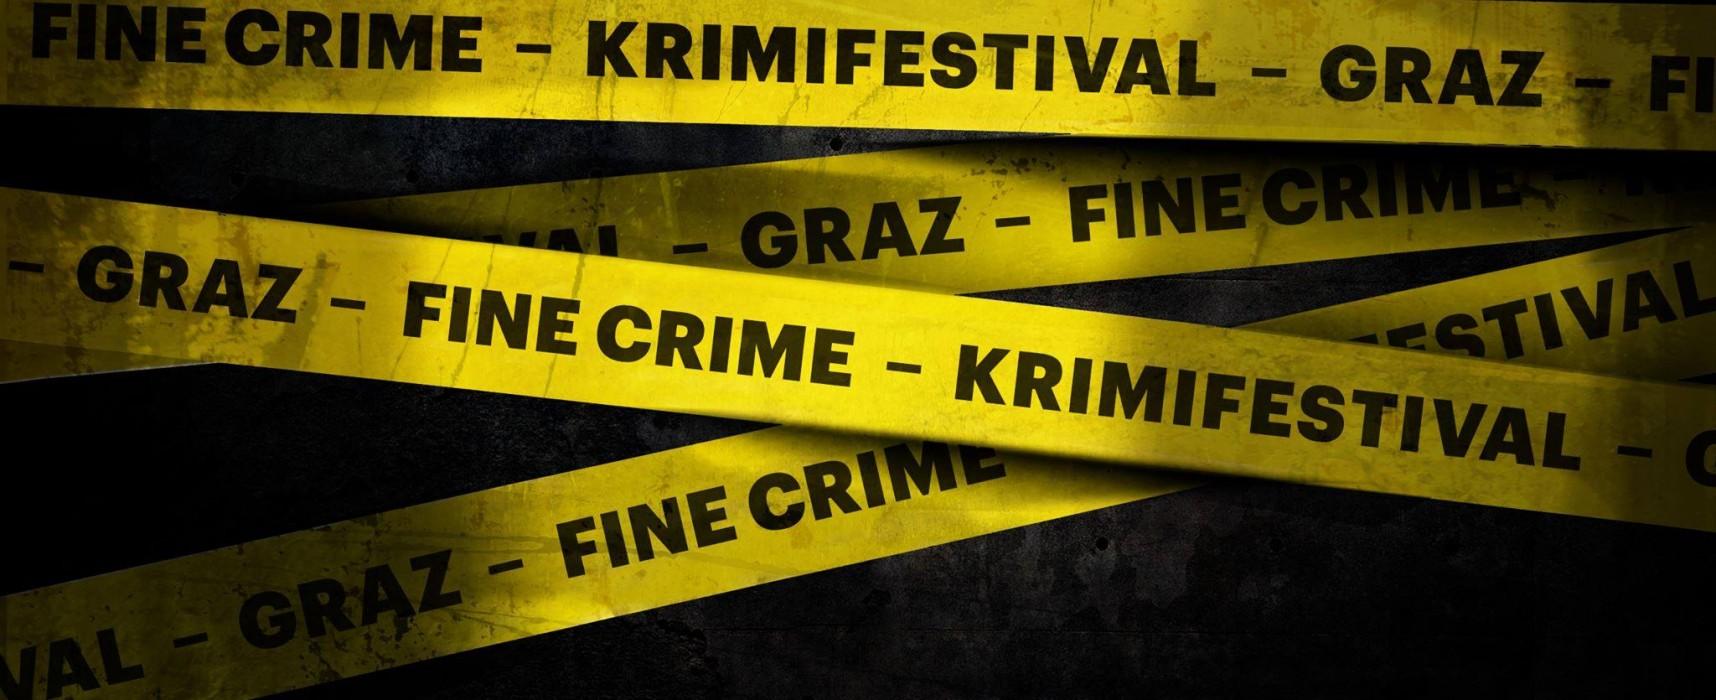 Fine Crime 12.3.2020 Lesung mit Michaela Kastel 19 Uhr